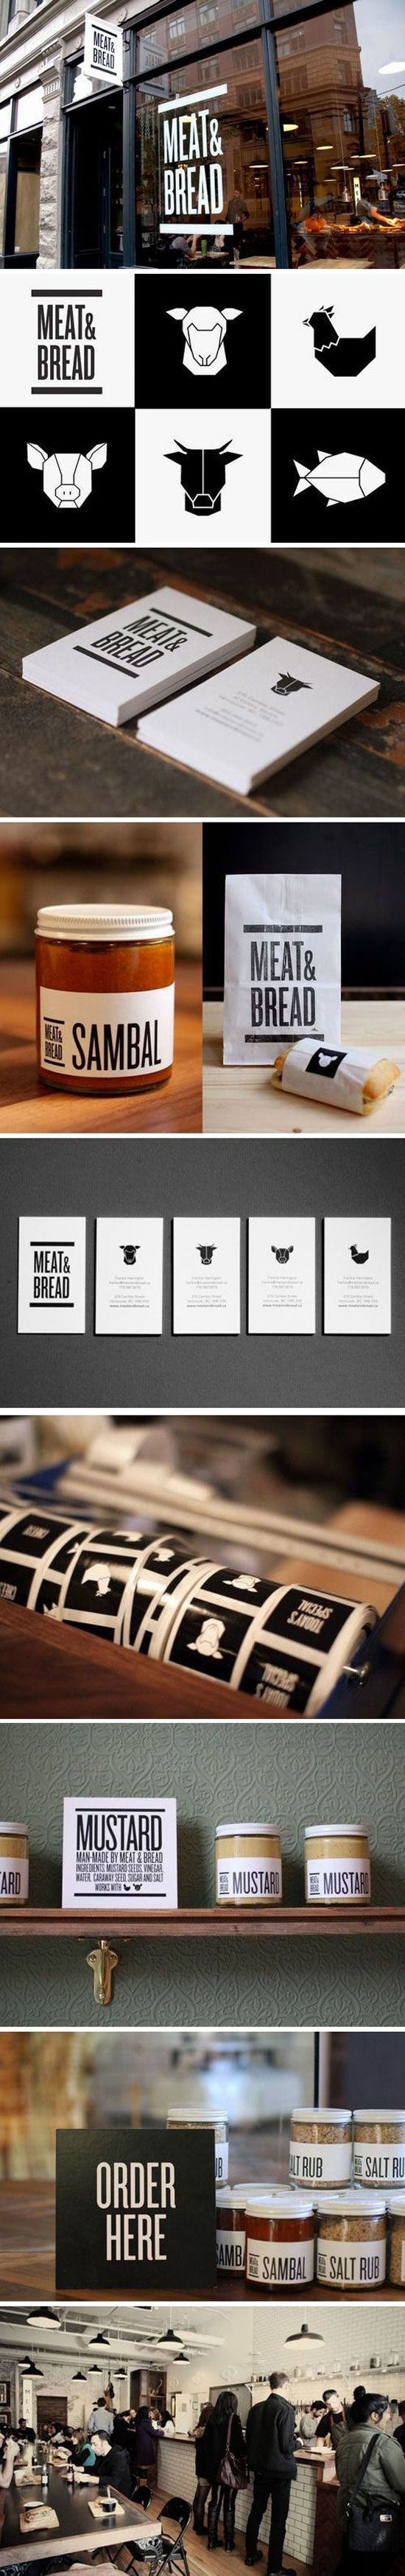 Brand identity design examples for restaurant